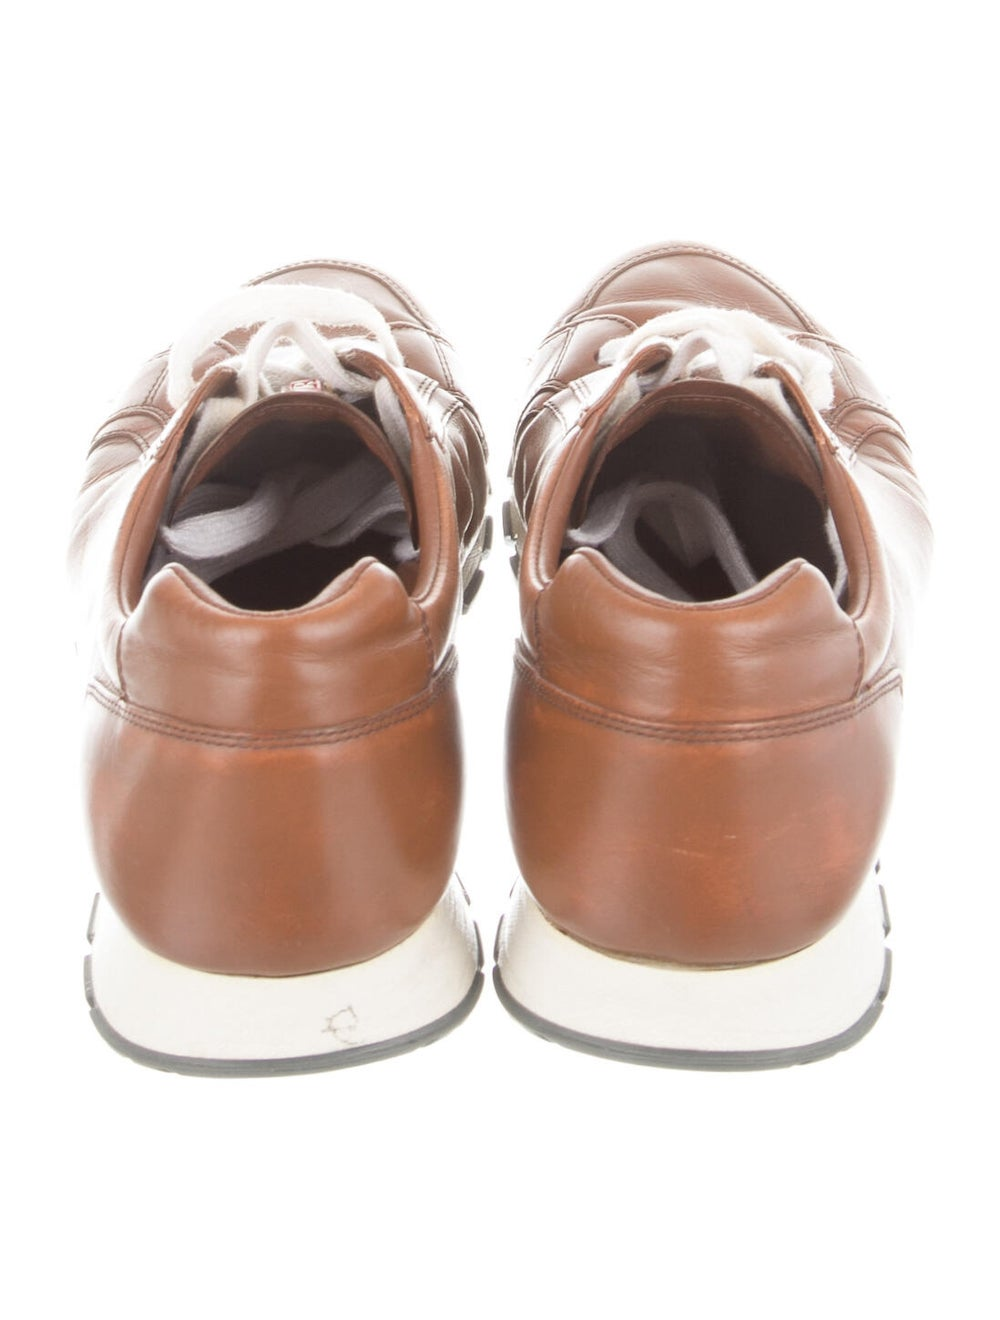 Prada Sport Leather Sneakers Brown - image 4